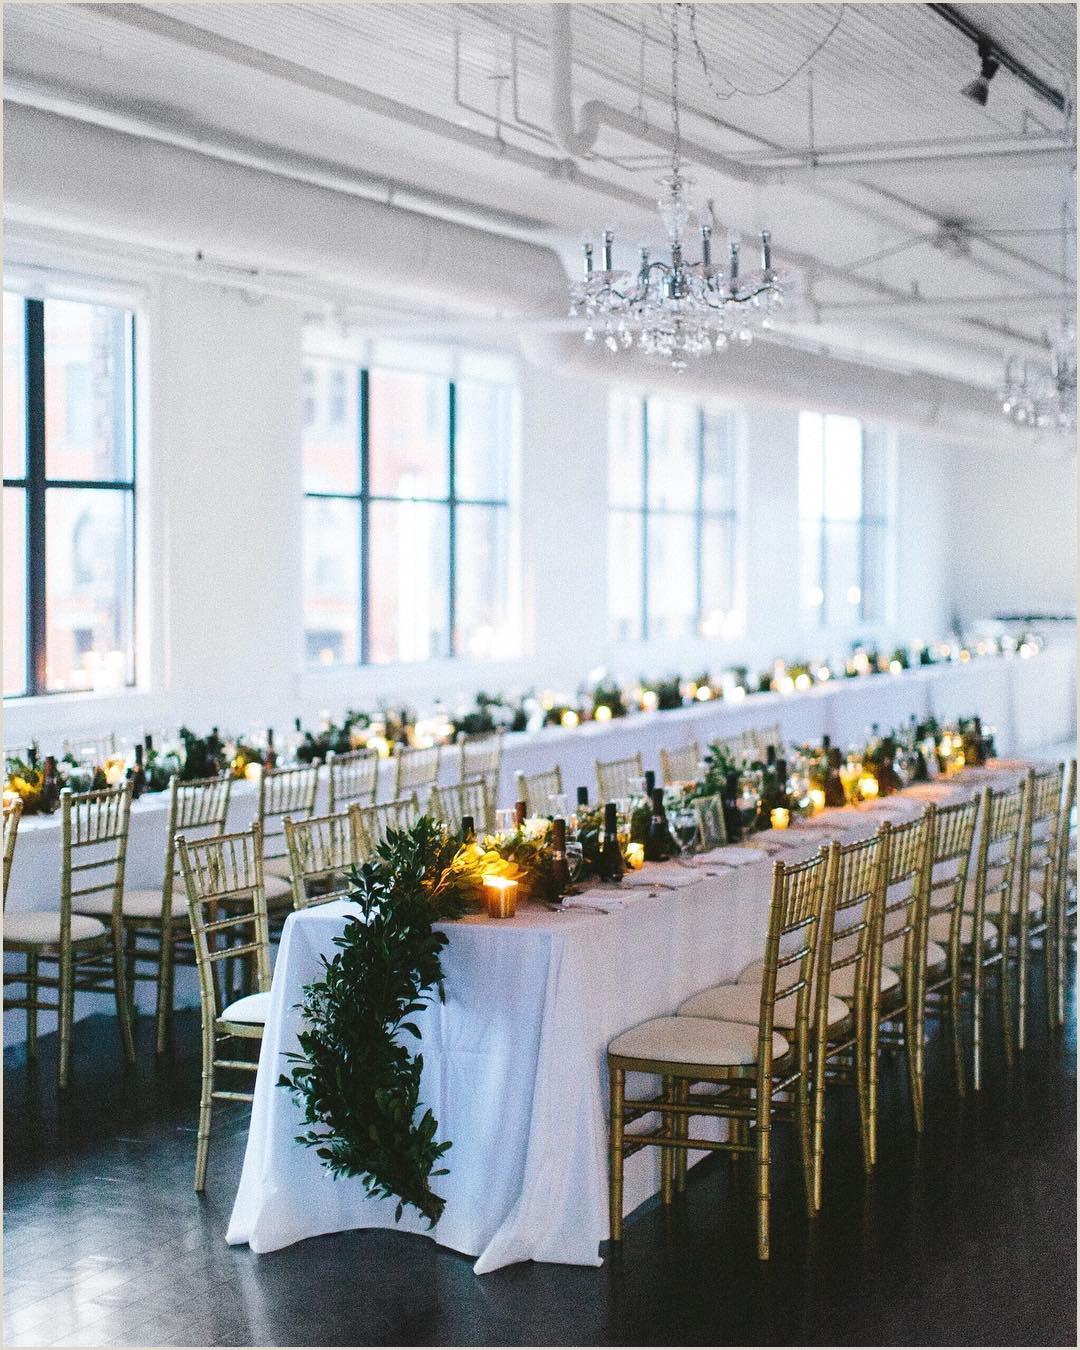 Michigan Rustic Wedding Venues the Ultimate Guide to Enchanting Wedding Venues In Michigan